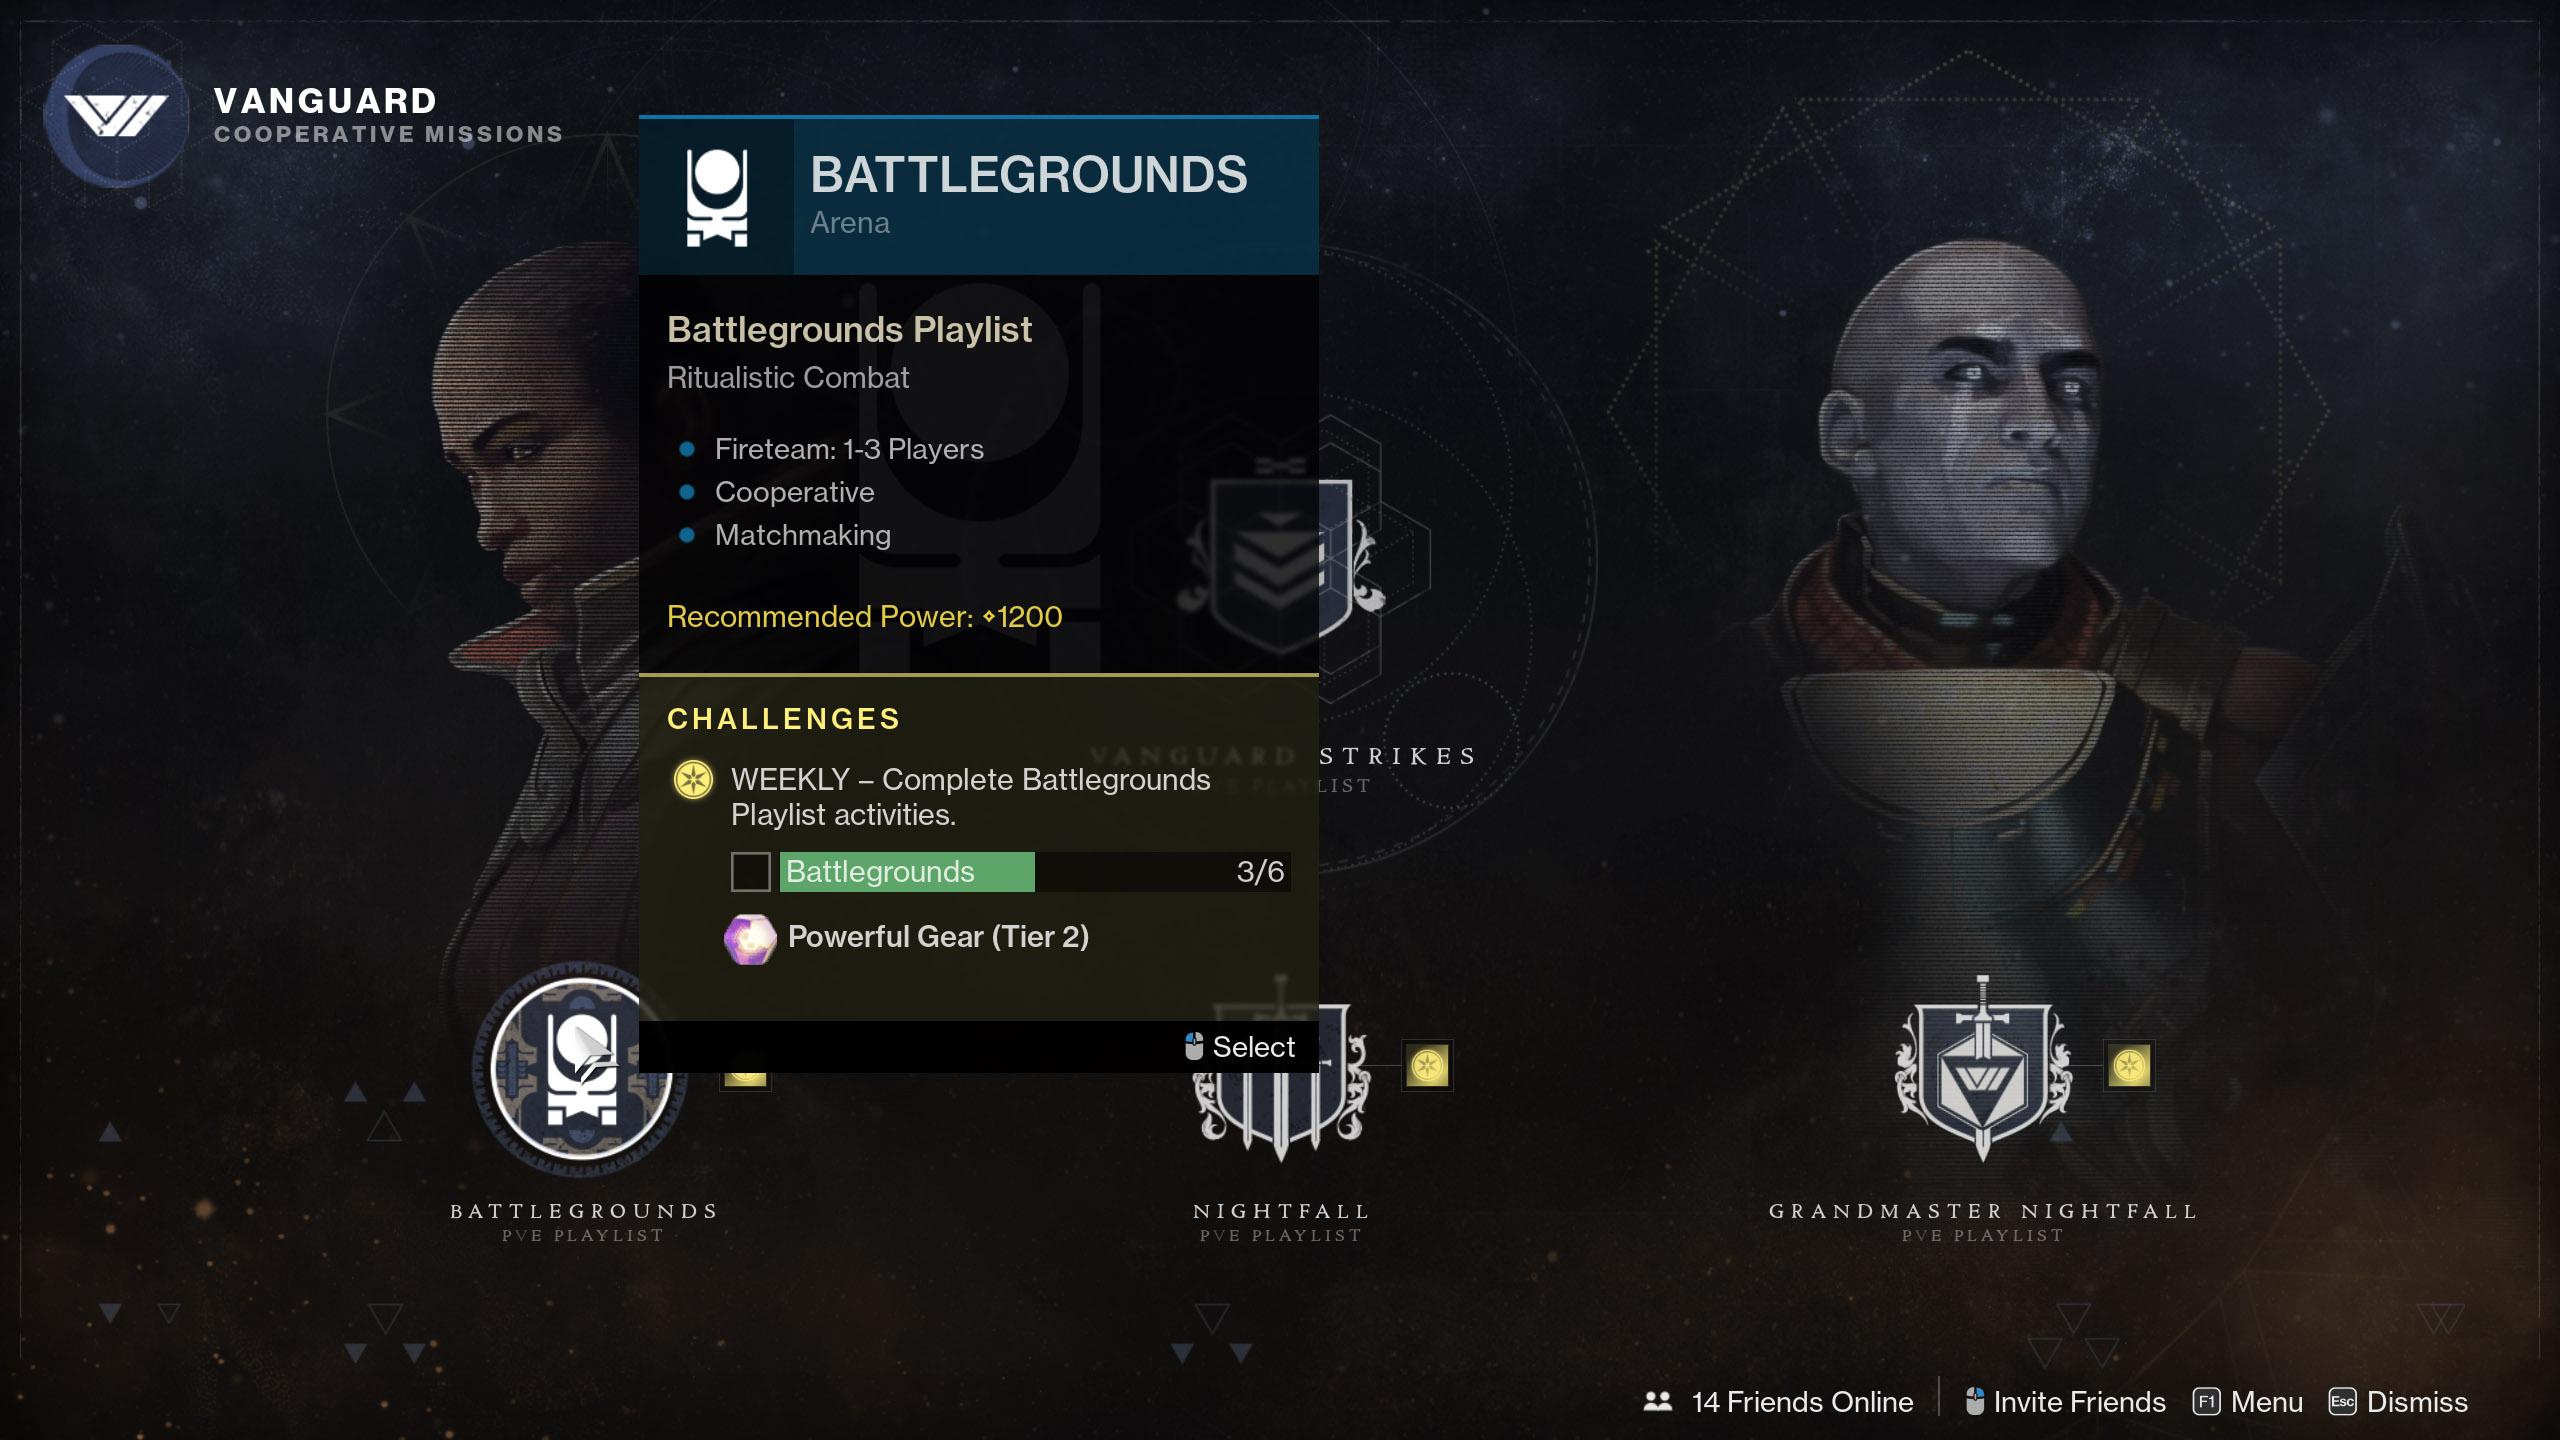 Destiny 2 Tribute Chests Battleground playlist